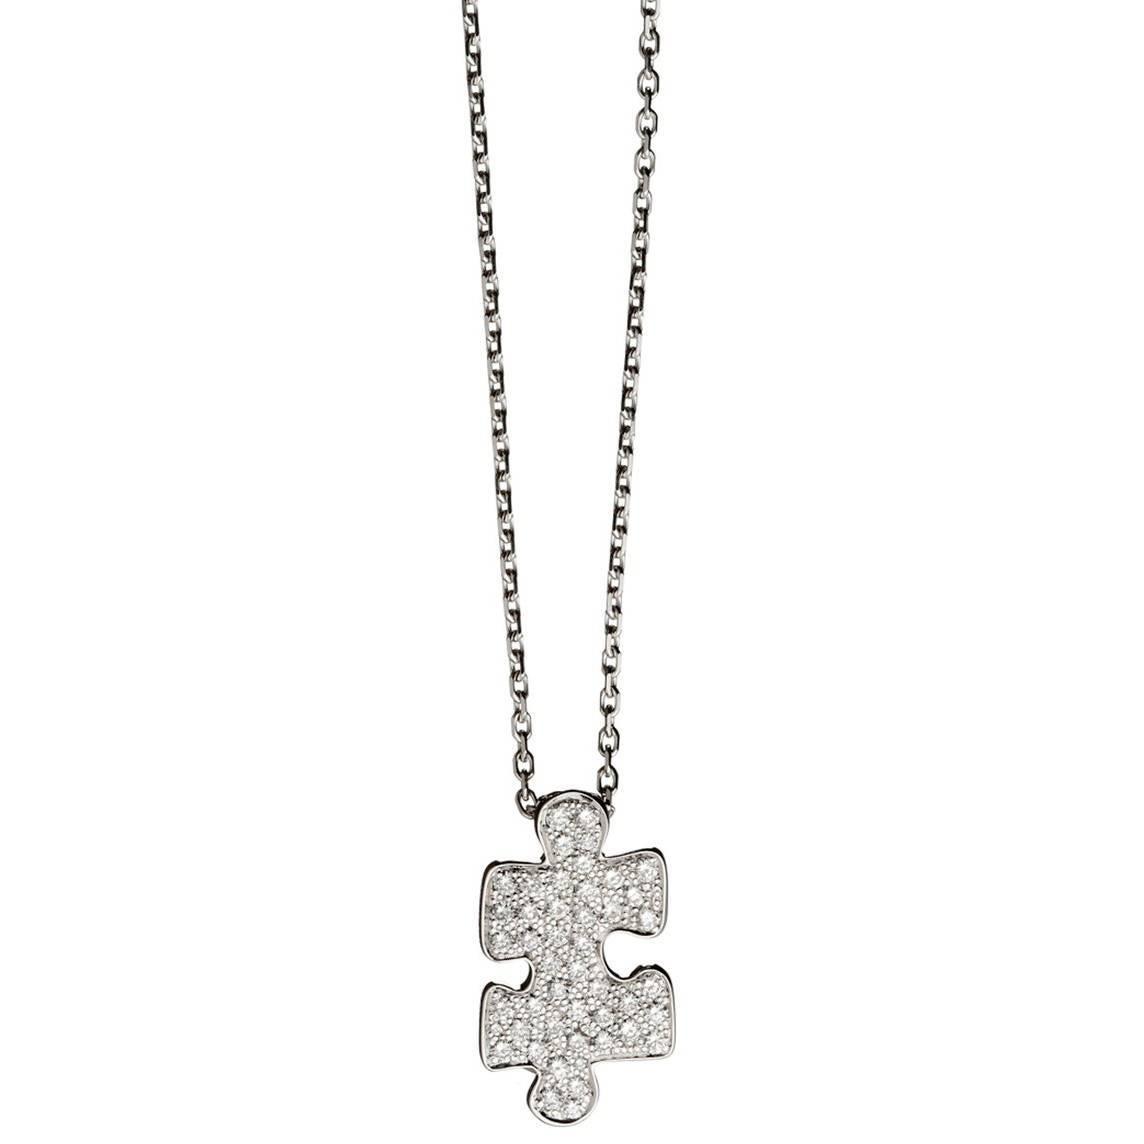 Akillis Puzzle White Gold With Diamonds Medium Pendant 32wYtJX